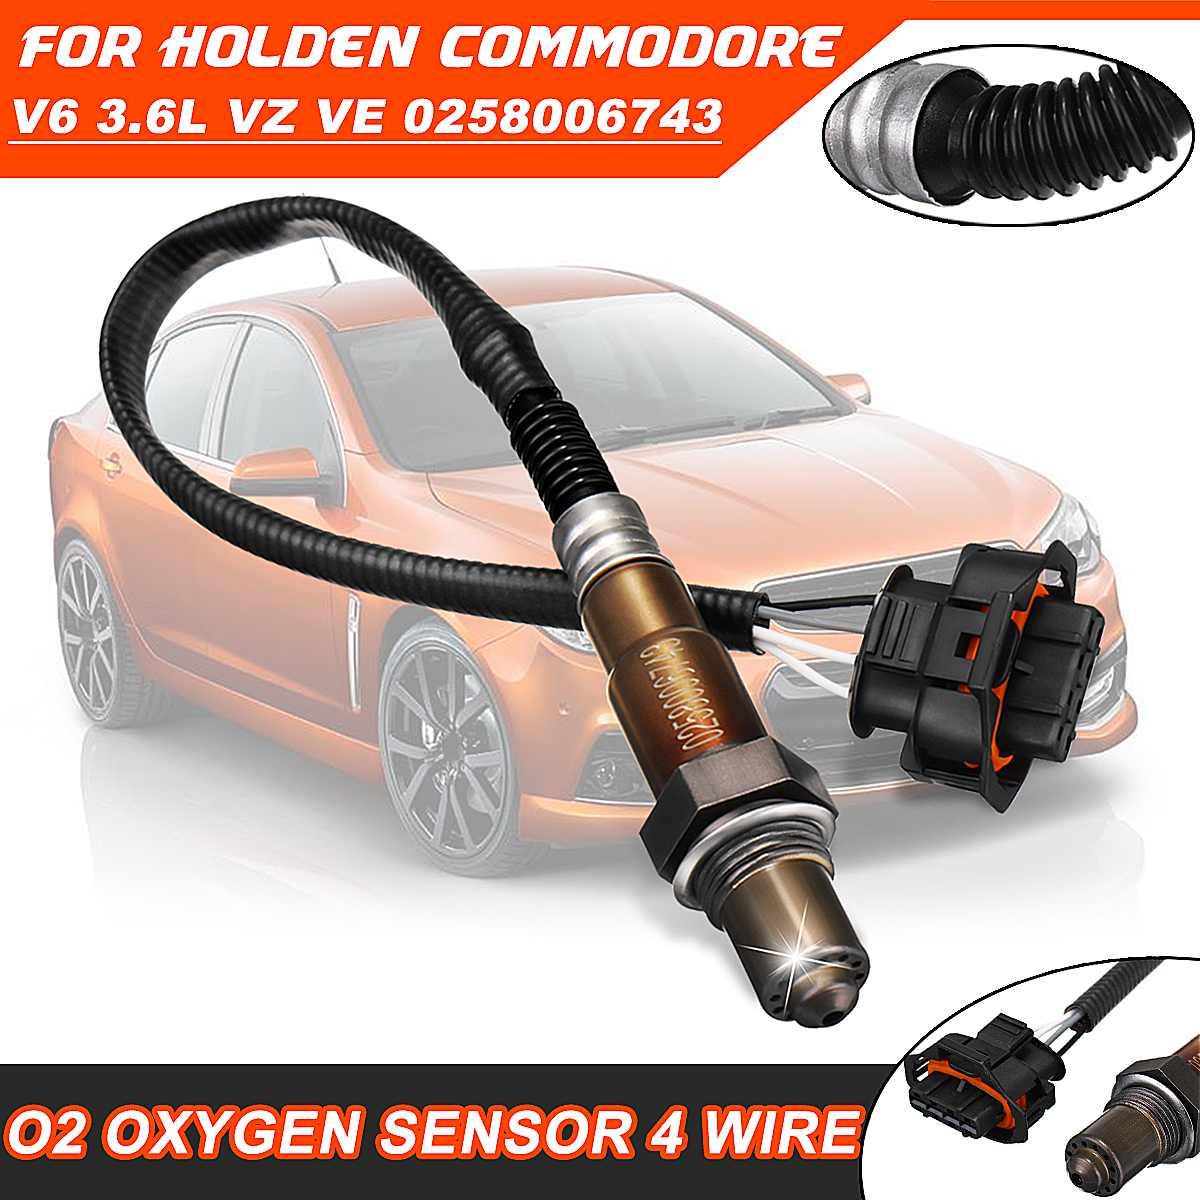 #02580067434 Wire O2 Oxygen Sensor For Holden Commodore VZ LE0 2004-2005 LY7 2005-2007 LW2 2007-2008 V6 3.6L VZ VE